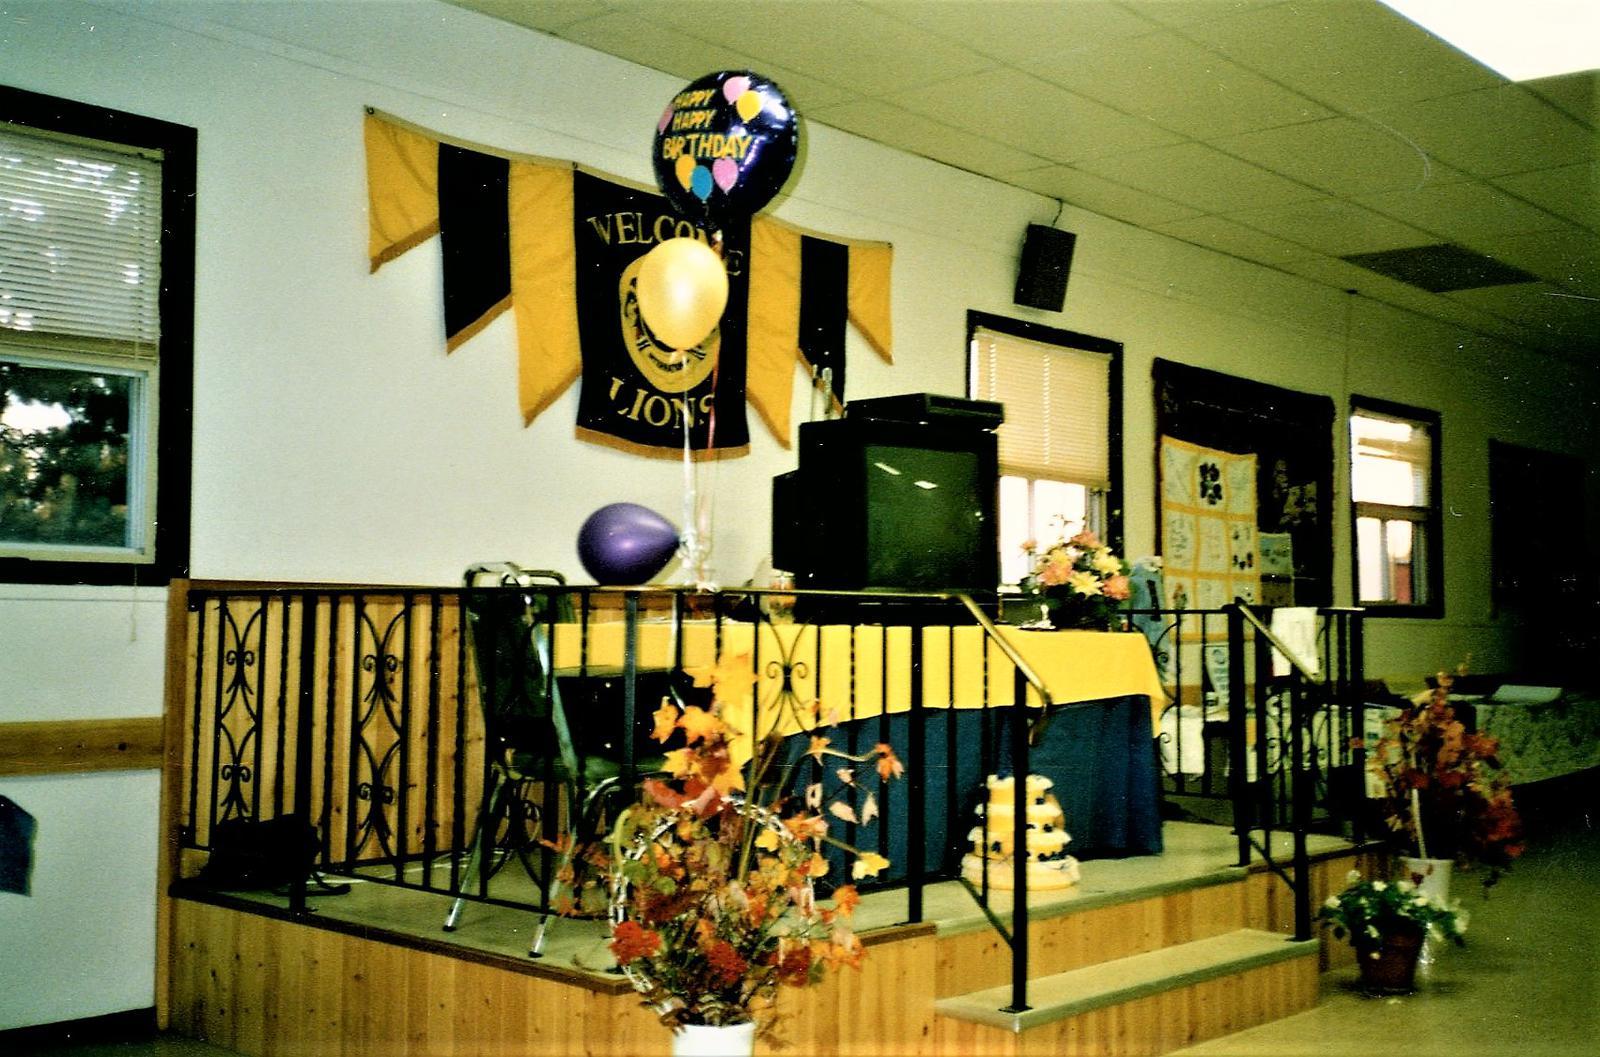 Lion's Birthday Party